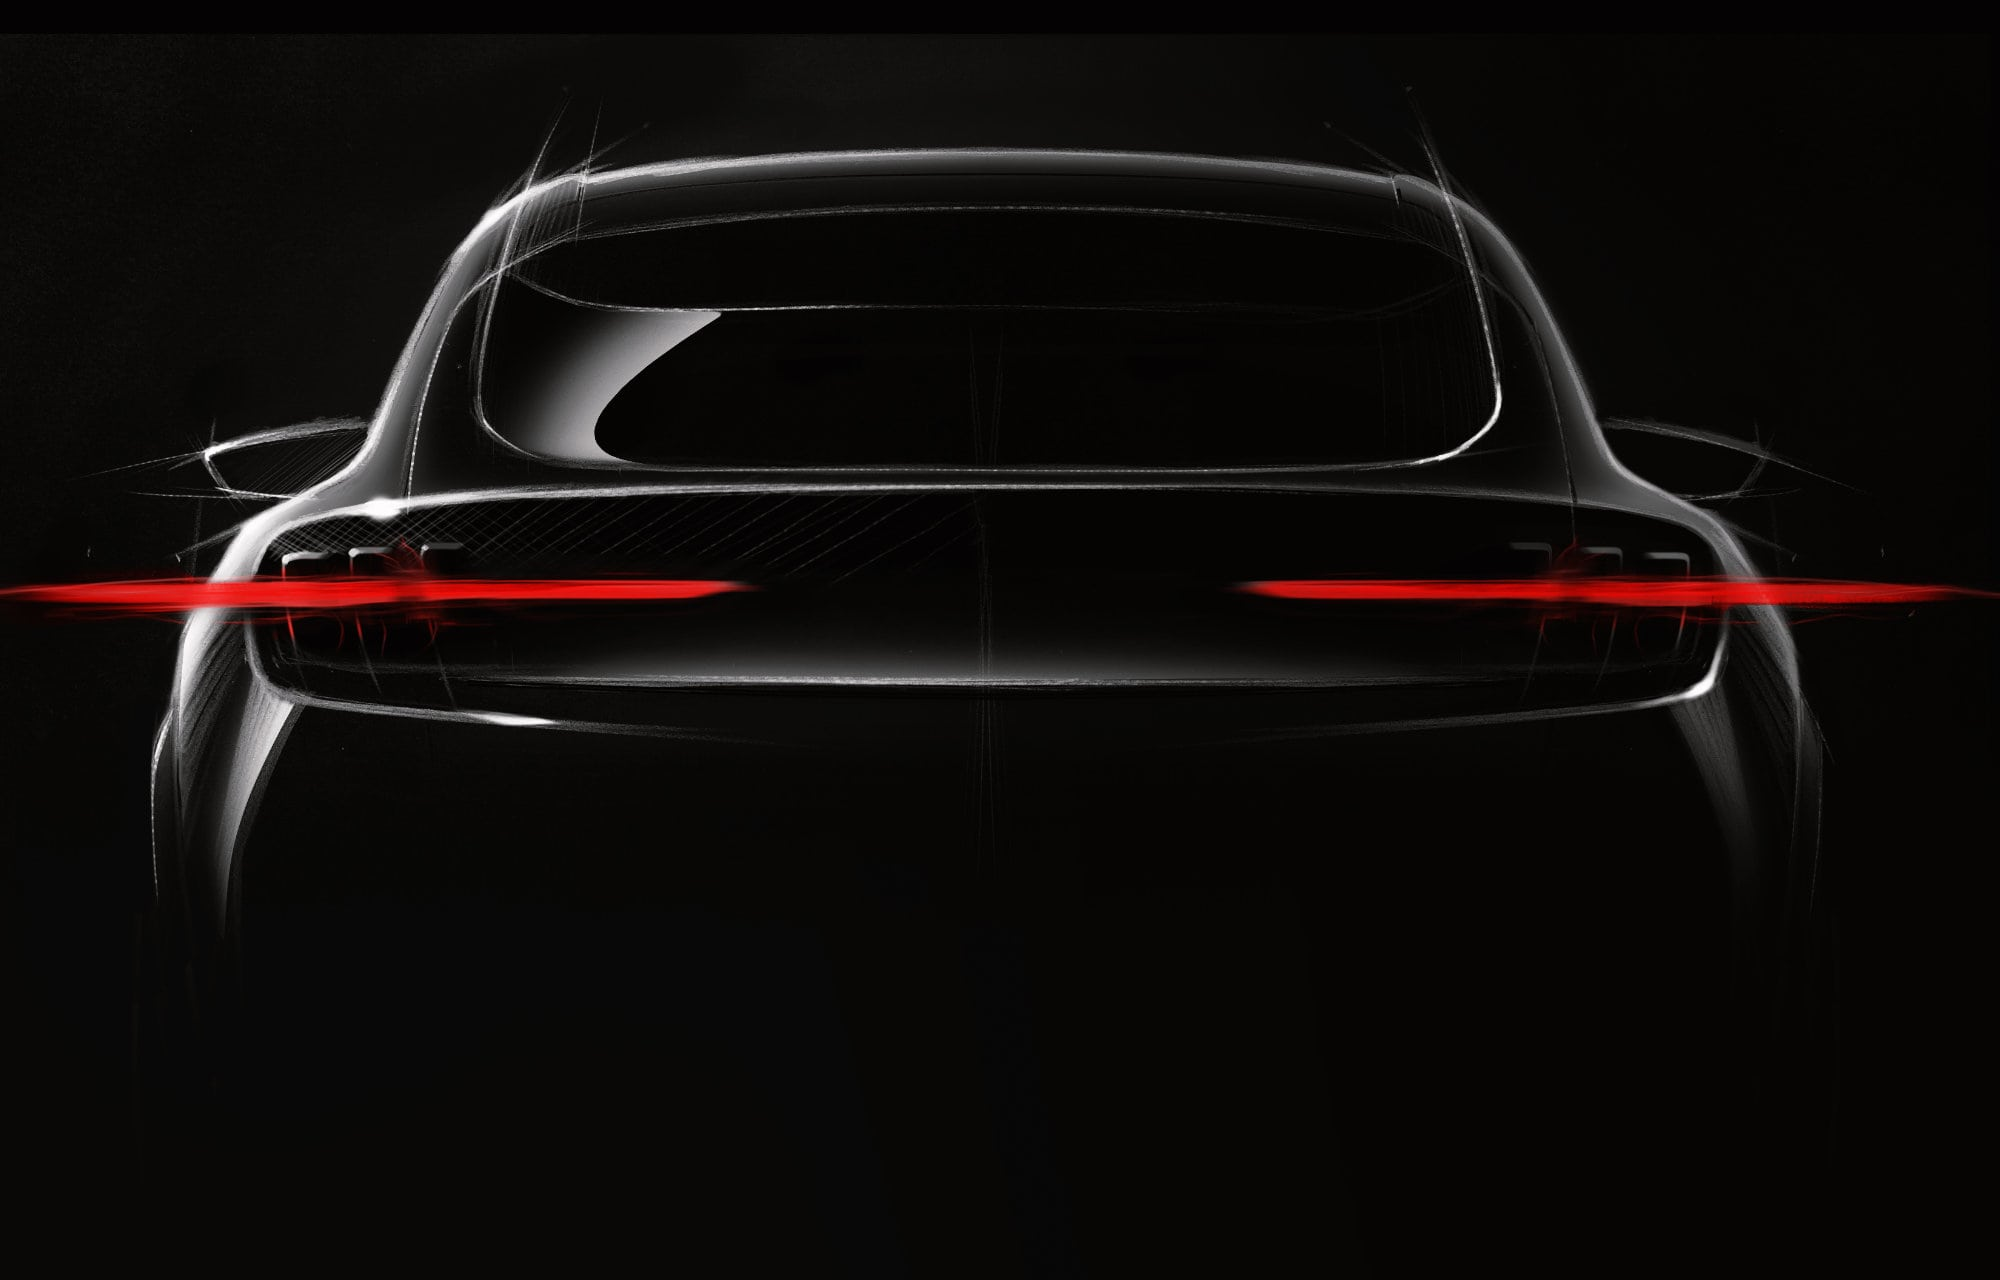 Op Mustang-geïnspireerde volledig elektrisch (EV) sportieve SUV verwacht eind 2020